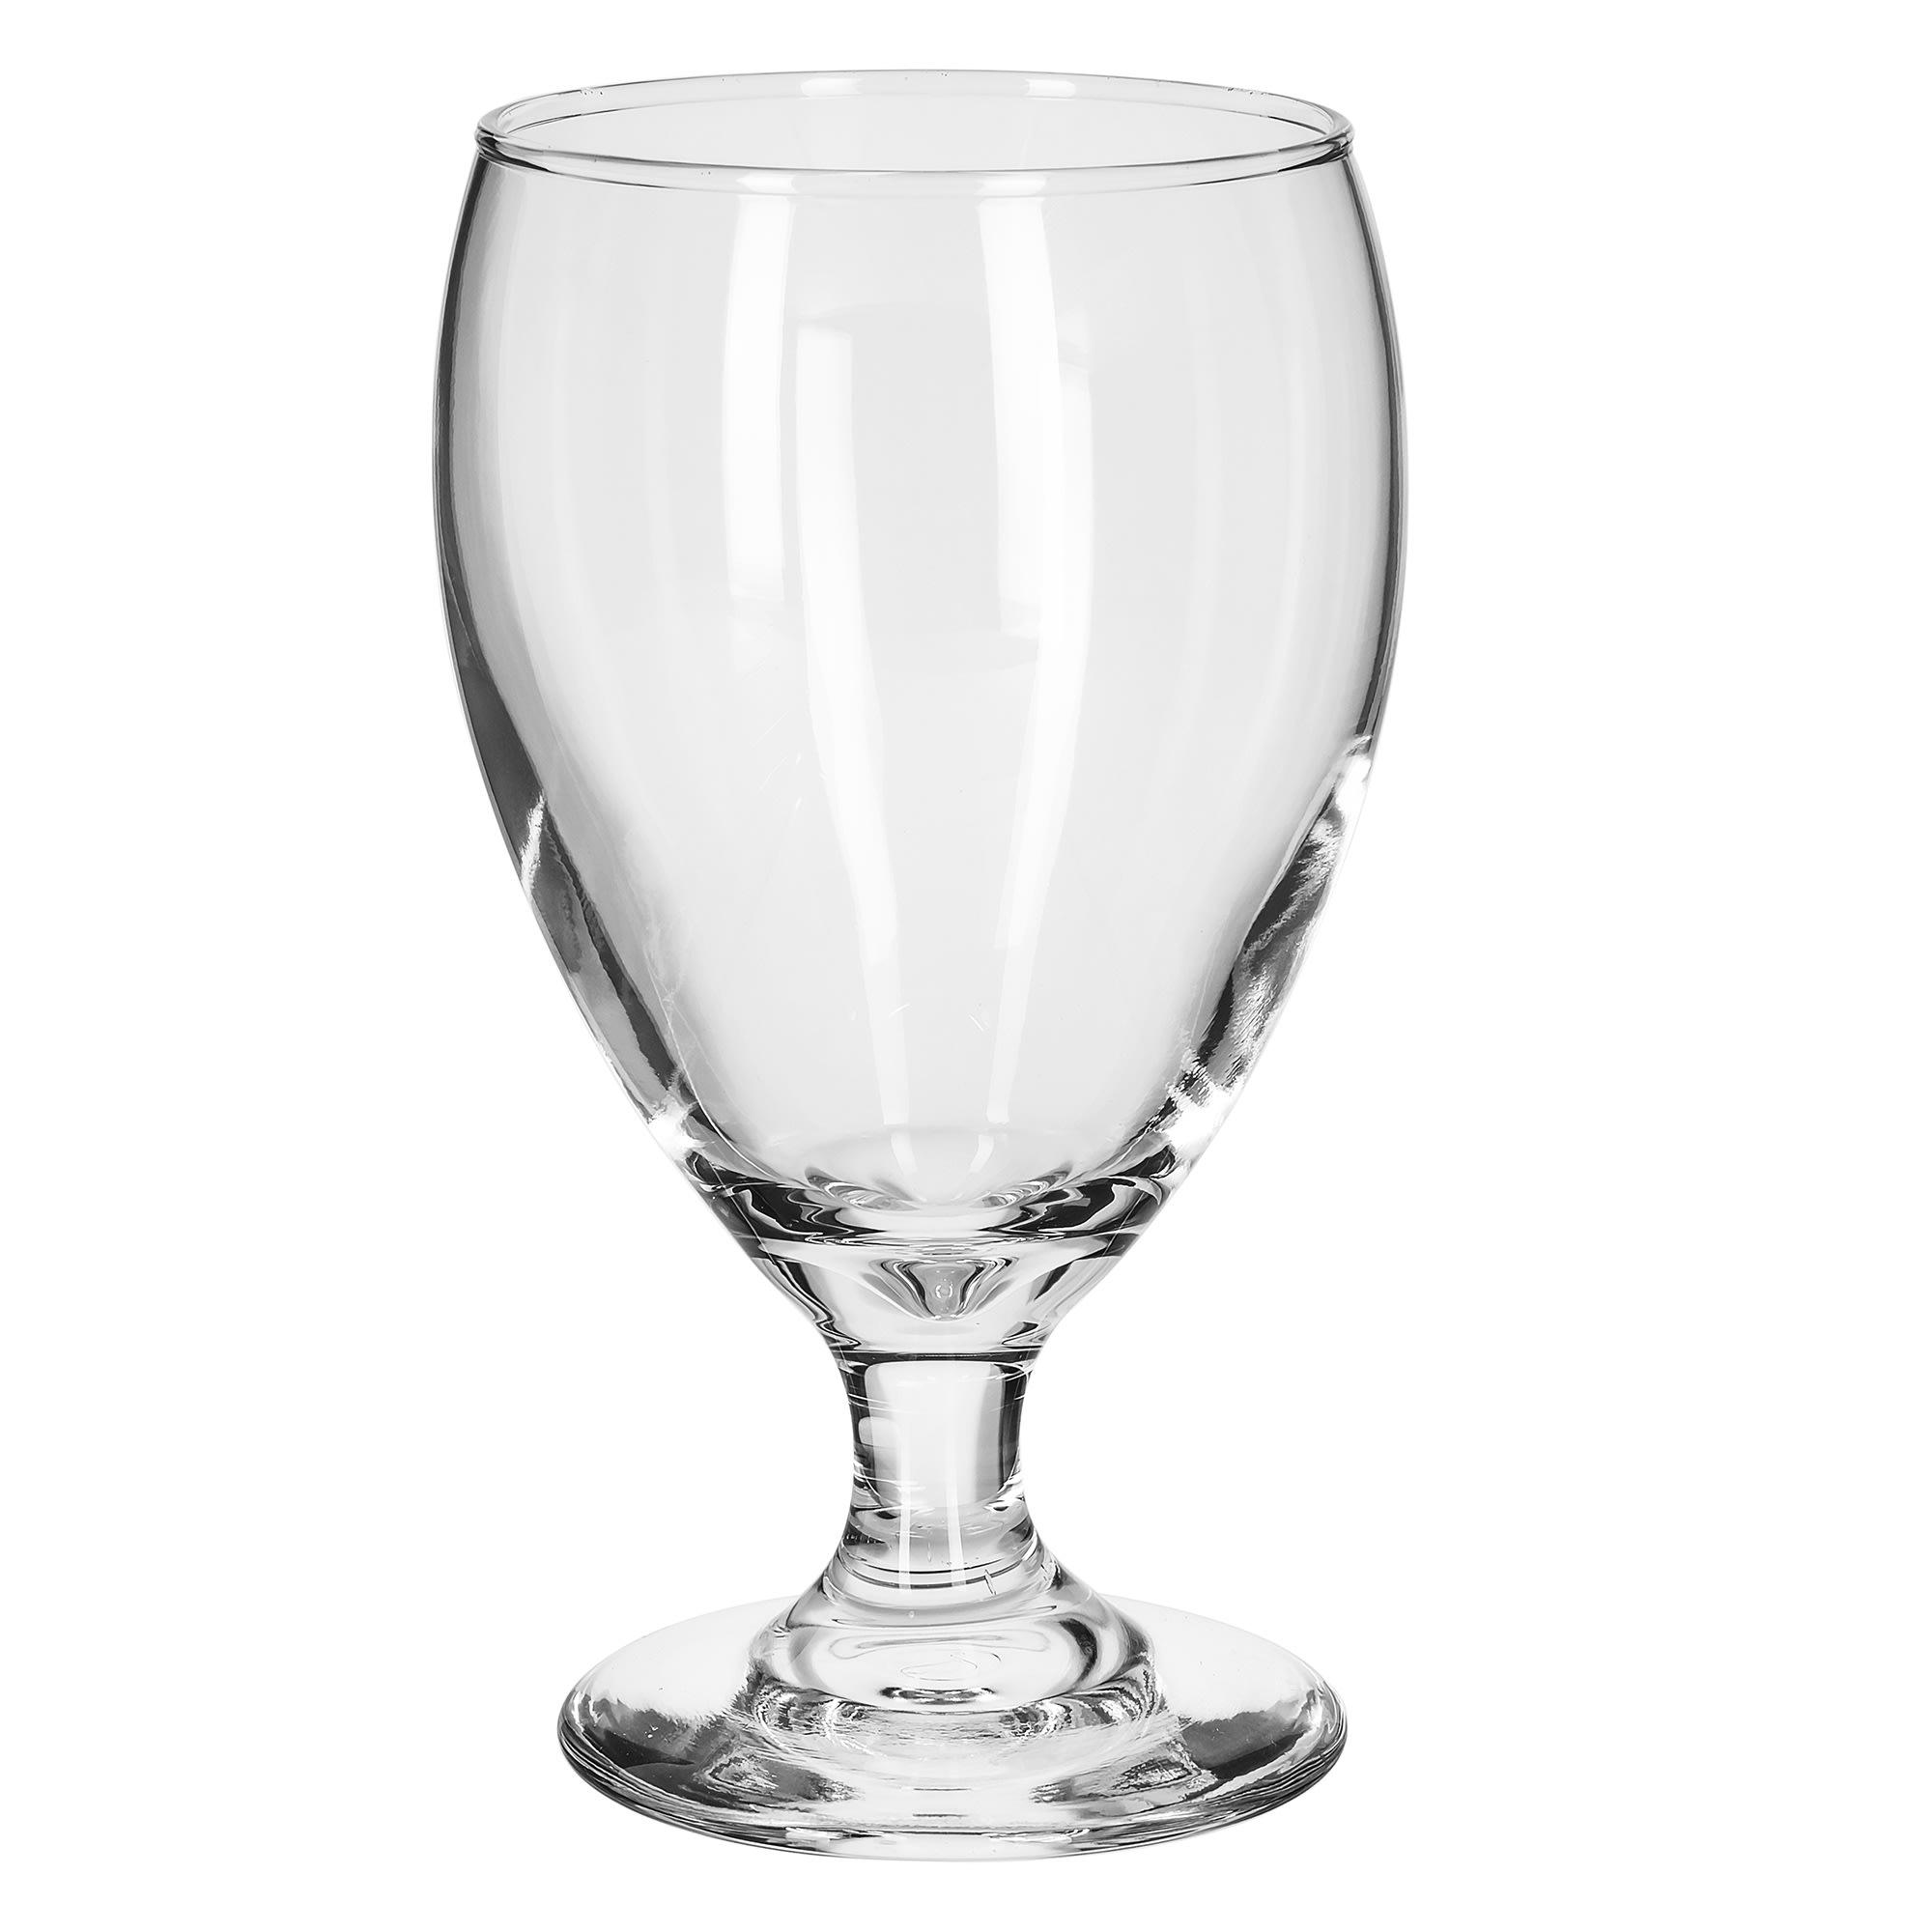 Libbey 3914 10.5 oz Teardrop Goblet Glass - Safedge Rim & Foot Guarantee